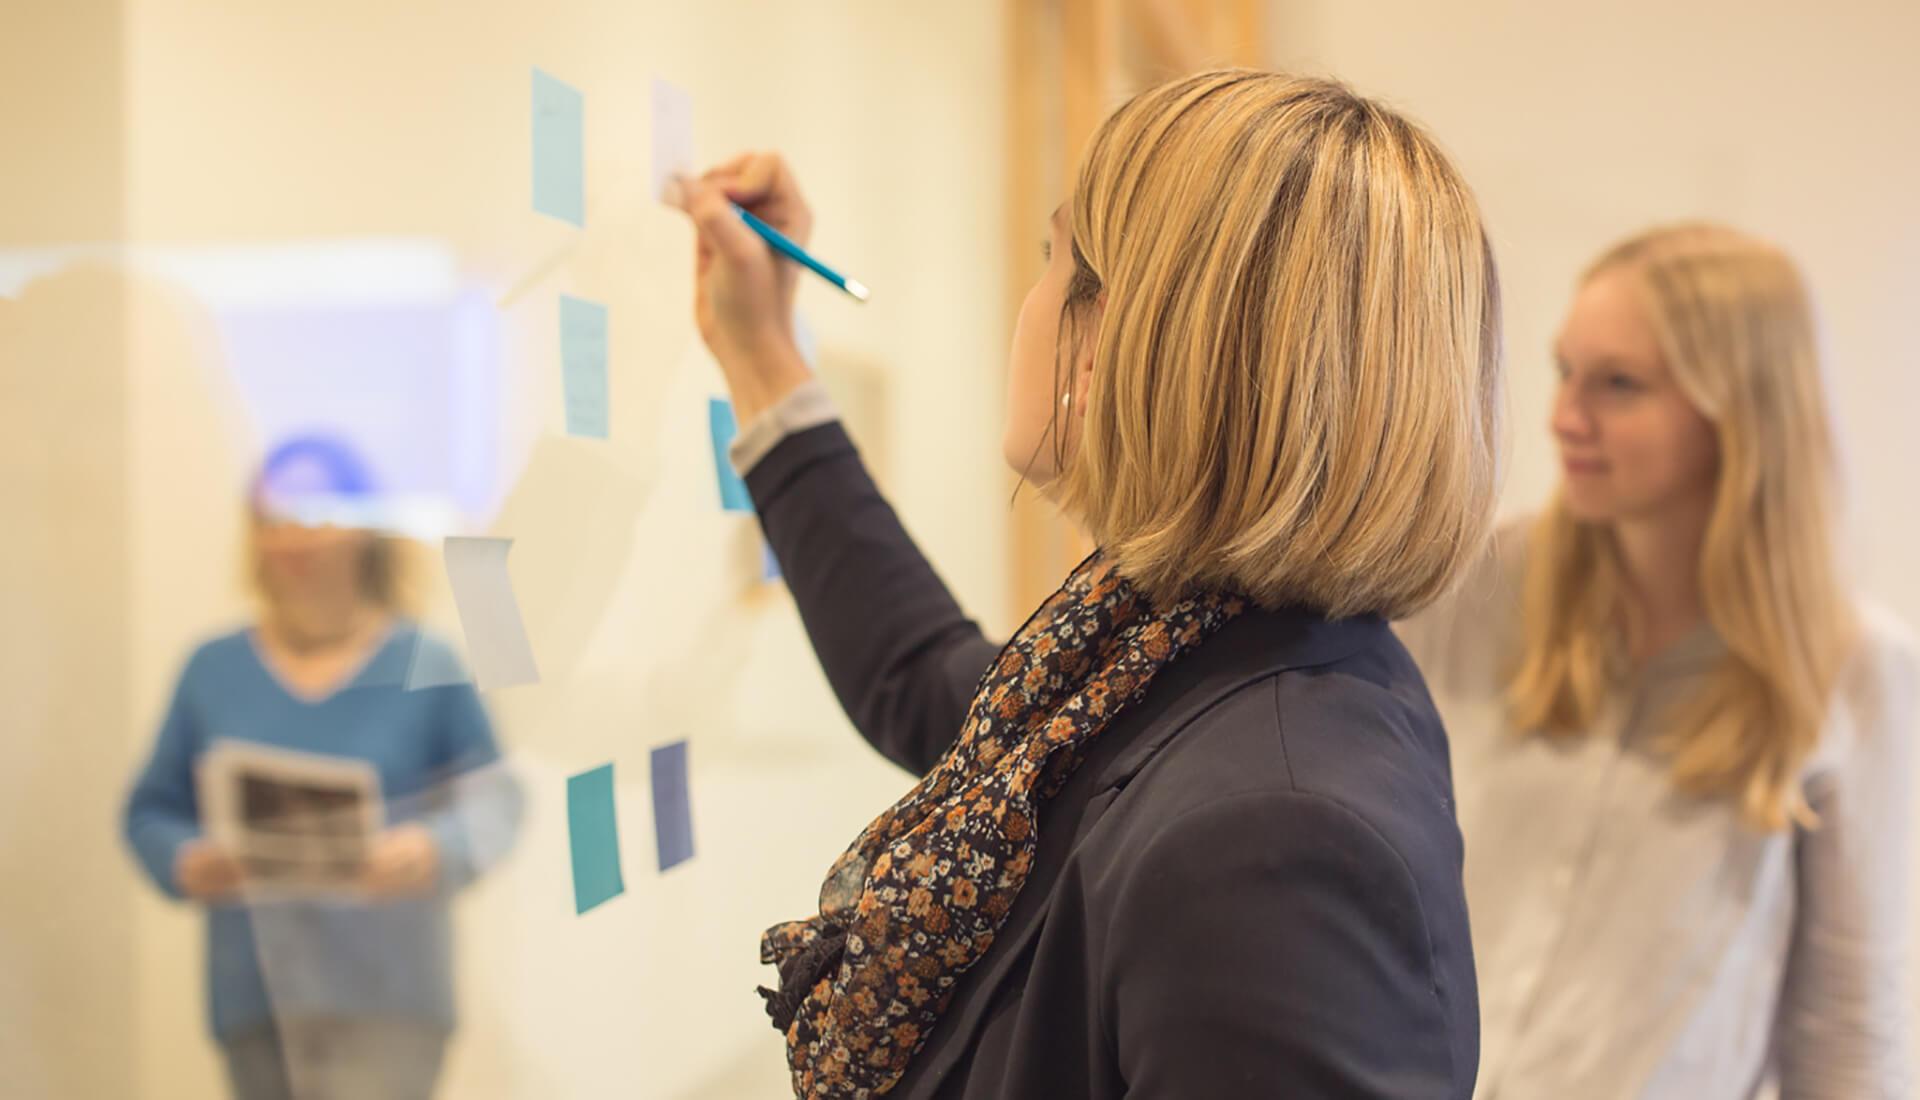 reintjes digital Agentur Ideenfindung